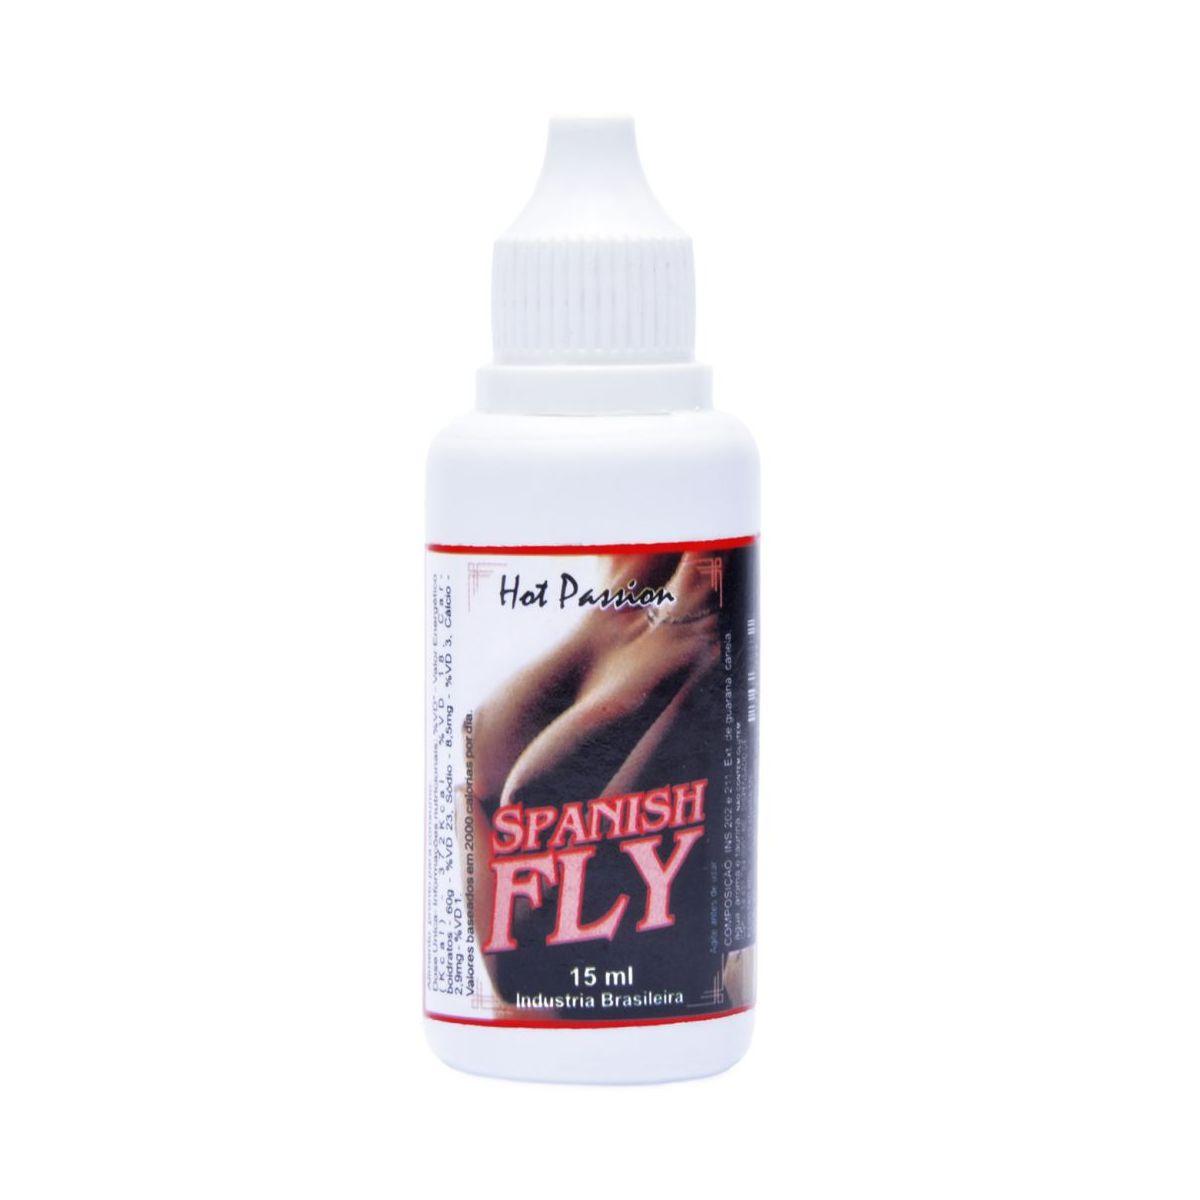 Gotas Afrodísiacas Spanish Fly Hot Passion 15ml